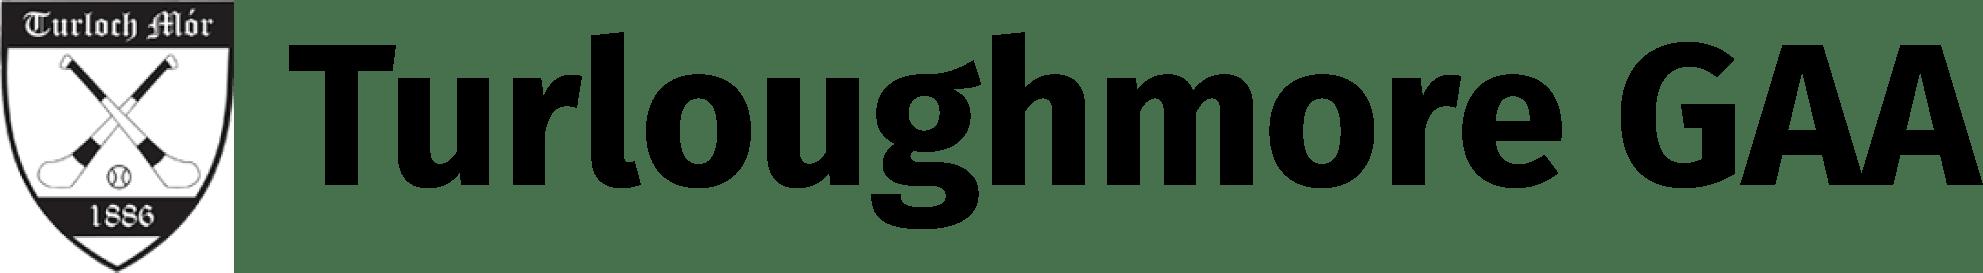 Turloughmore GAA Logo